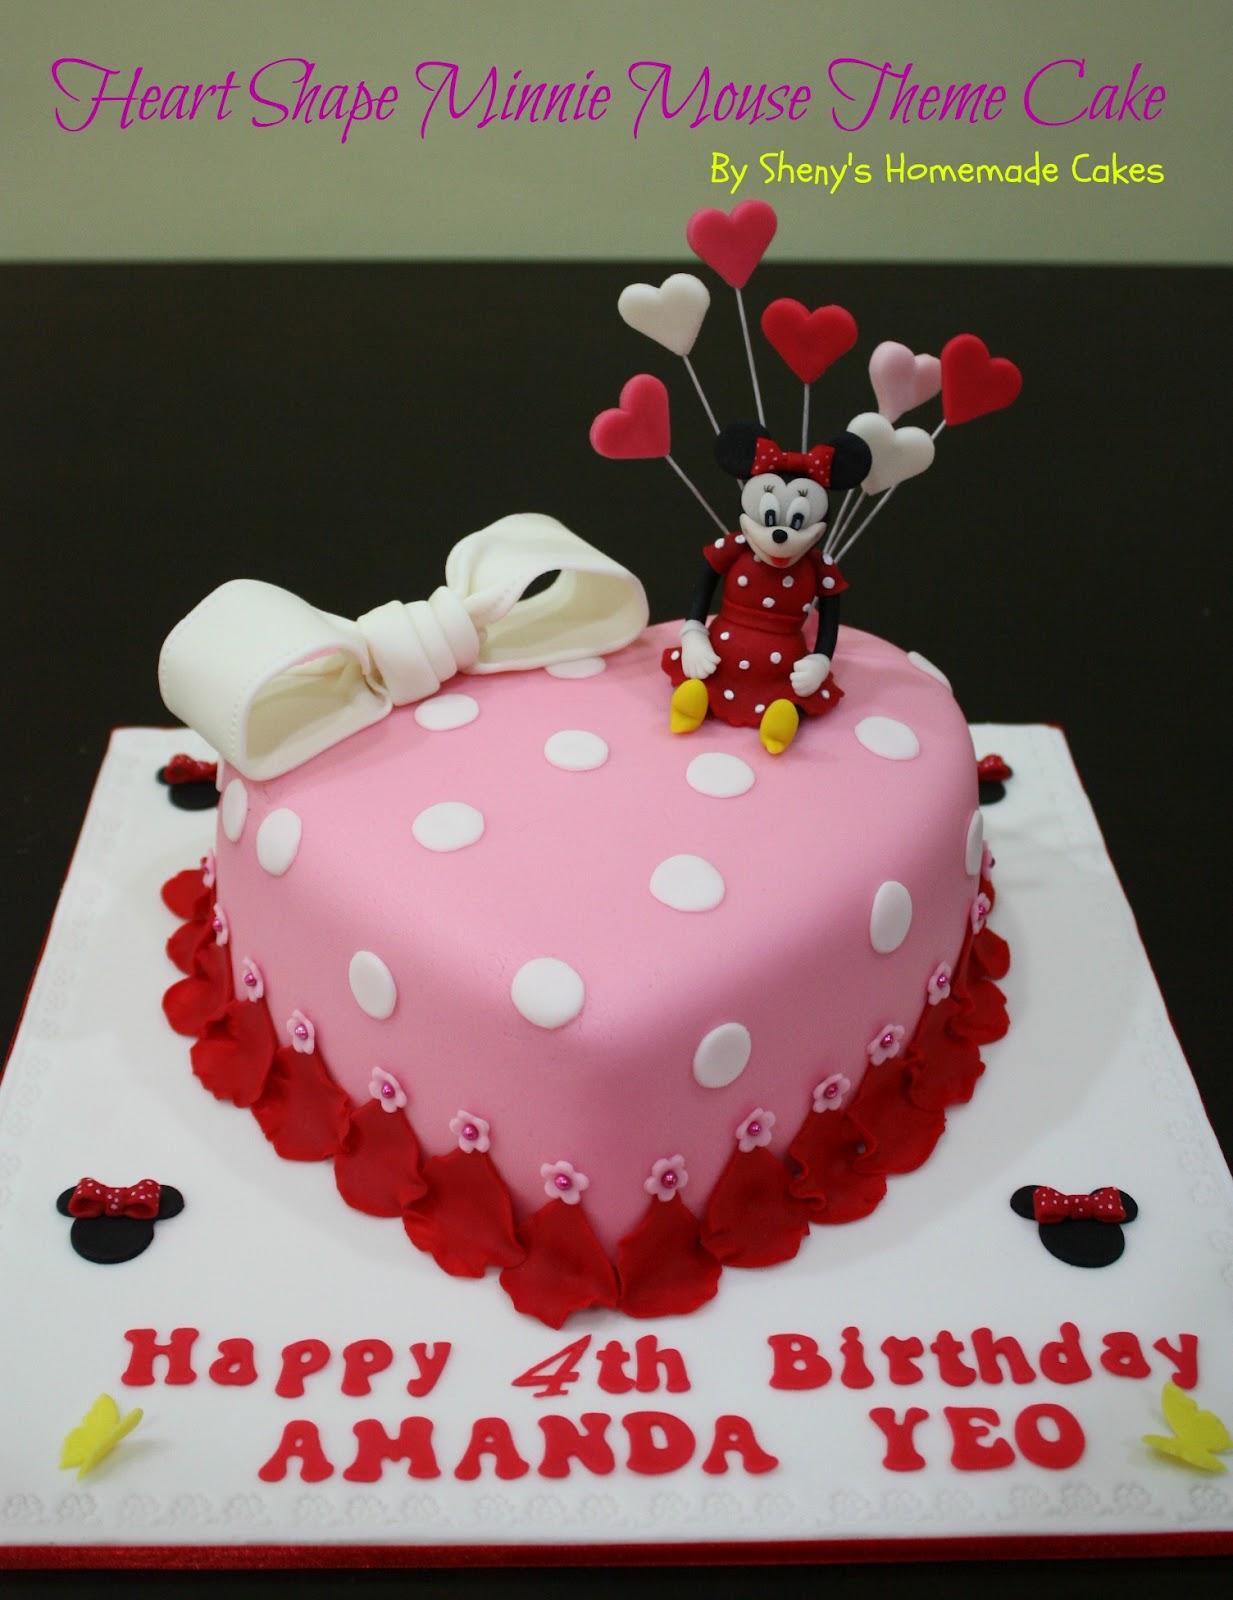 Shenys Homemade Treats Minnie Mouse Theme Birthday Cake For Amanda